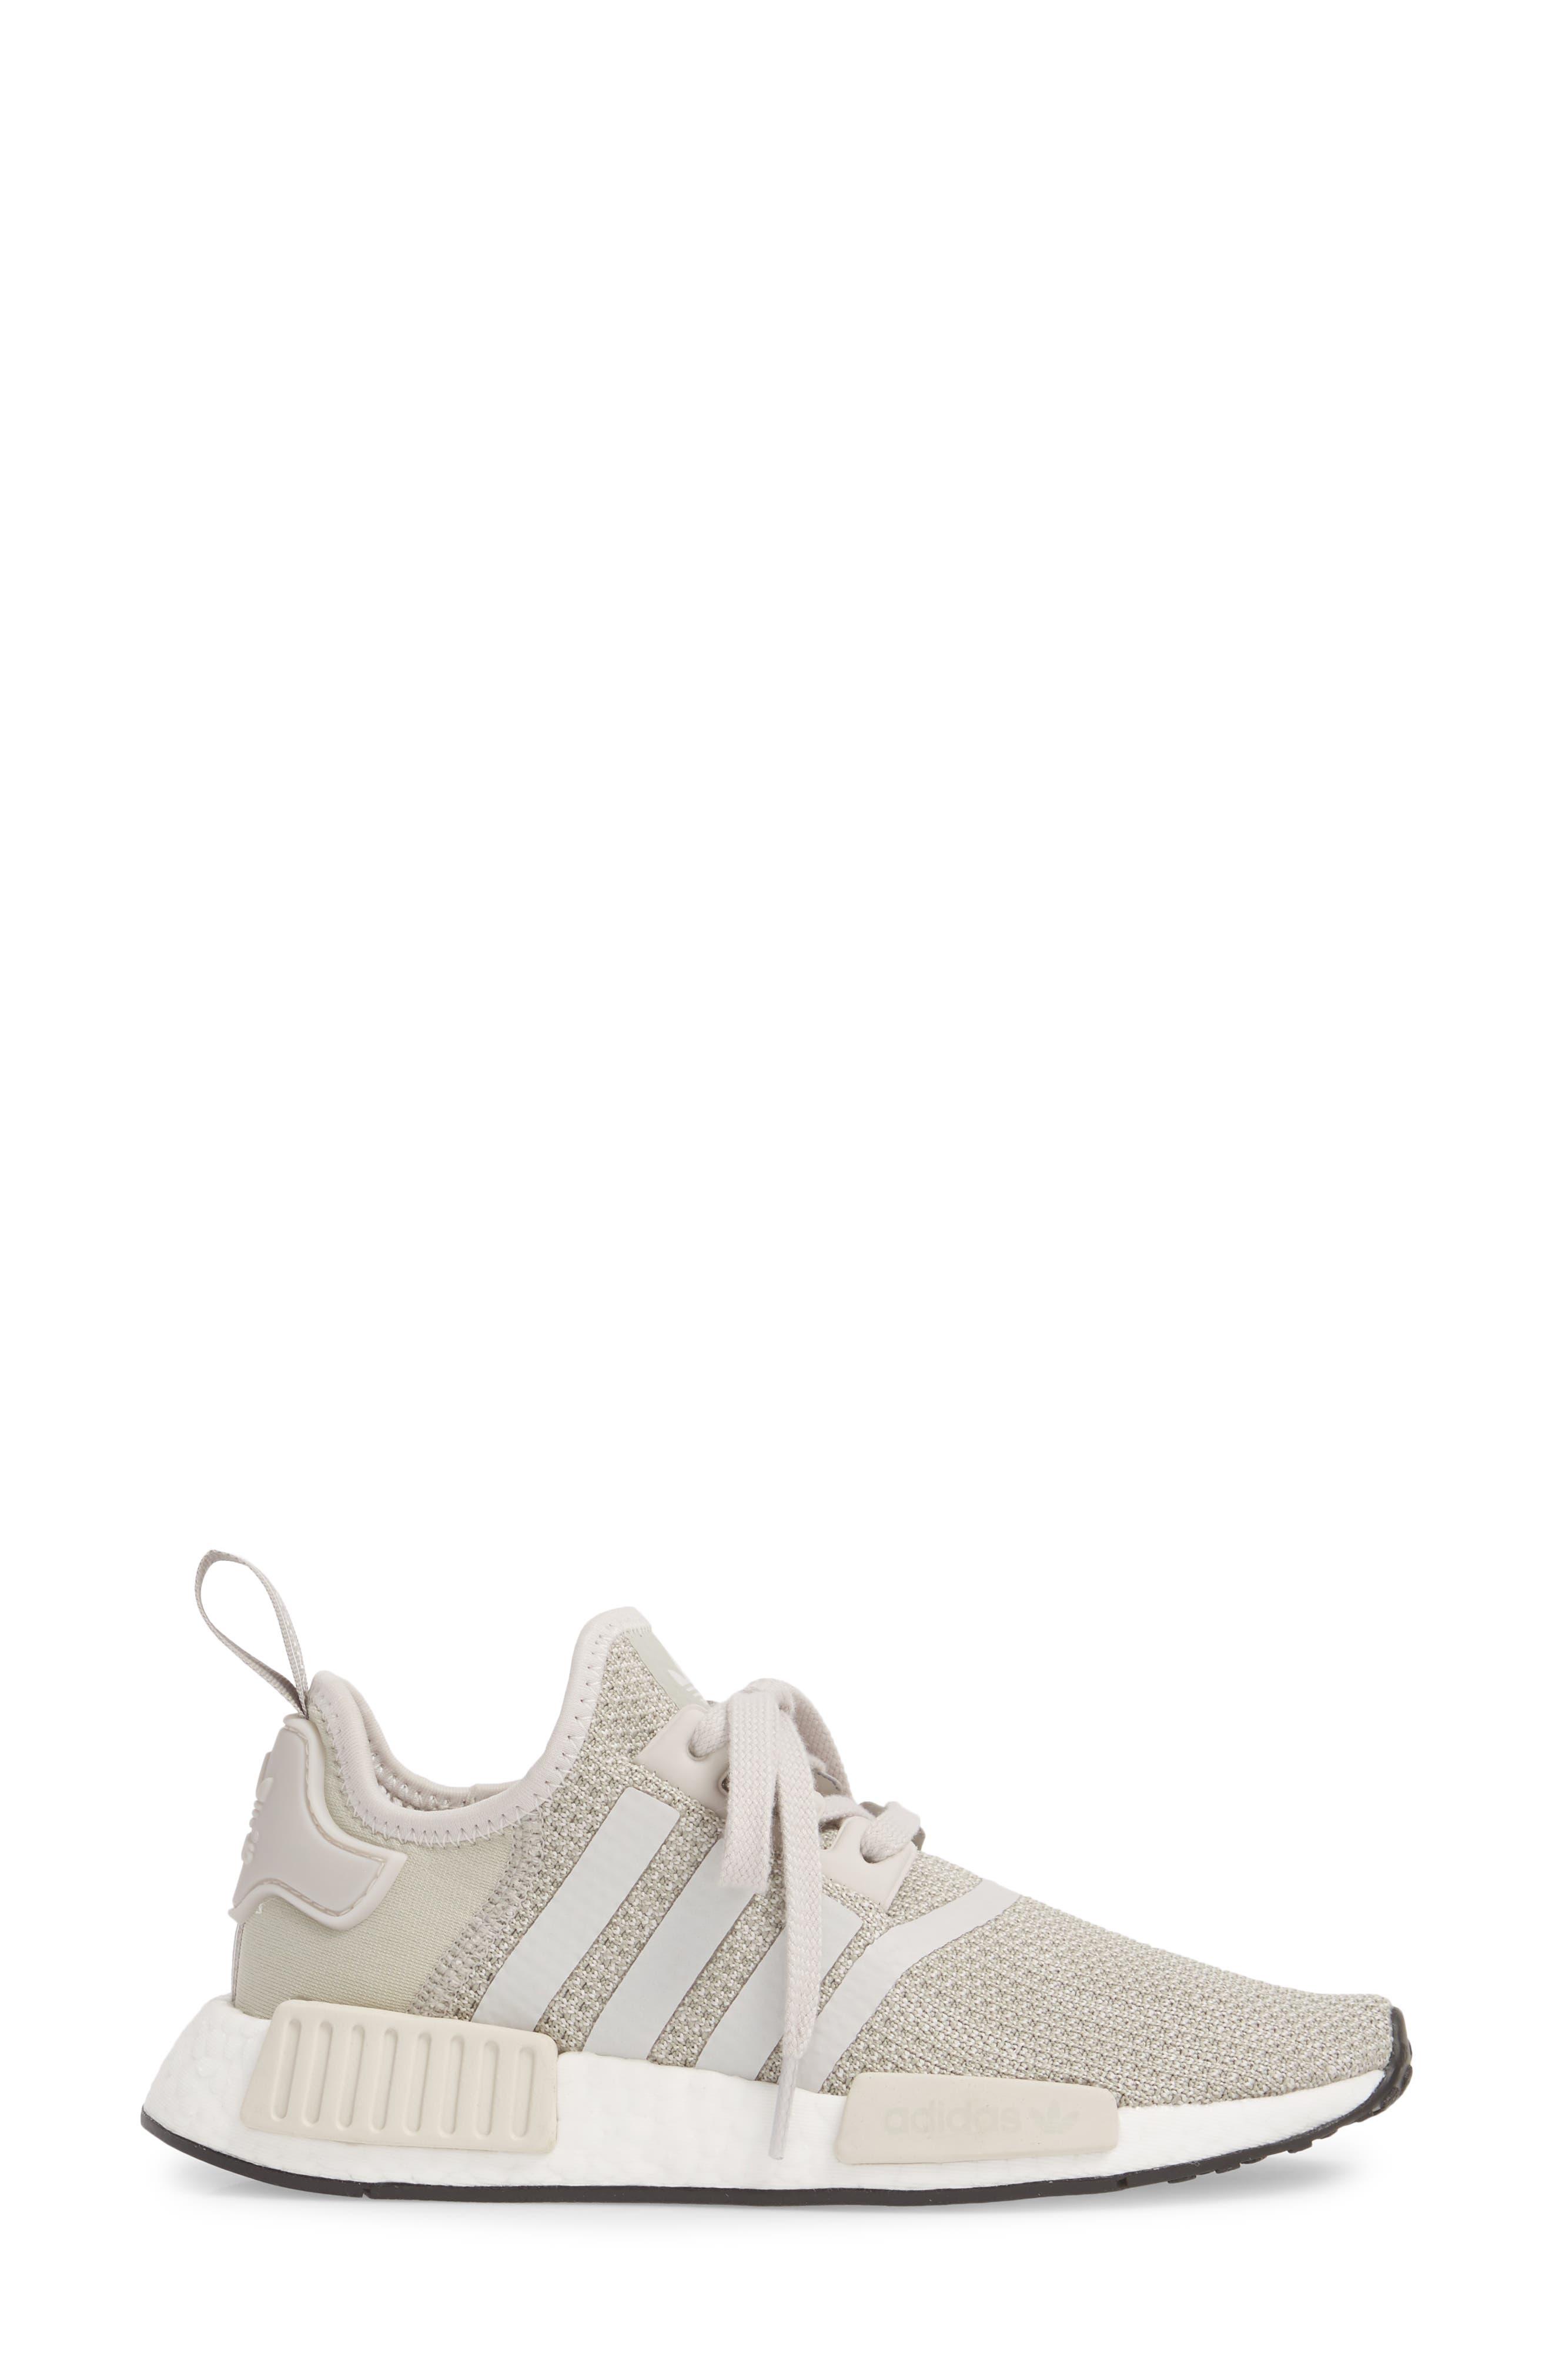 Alternate Image 3  - adidas NMD R1 Athletic Shoe (Women)